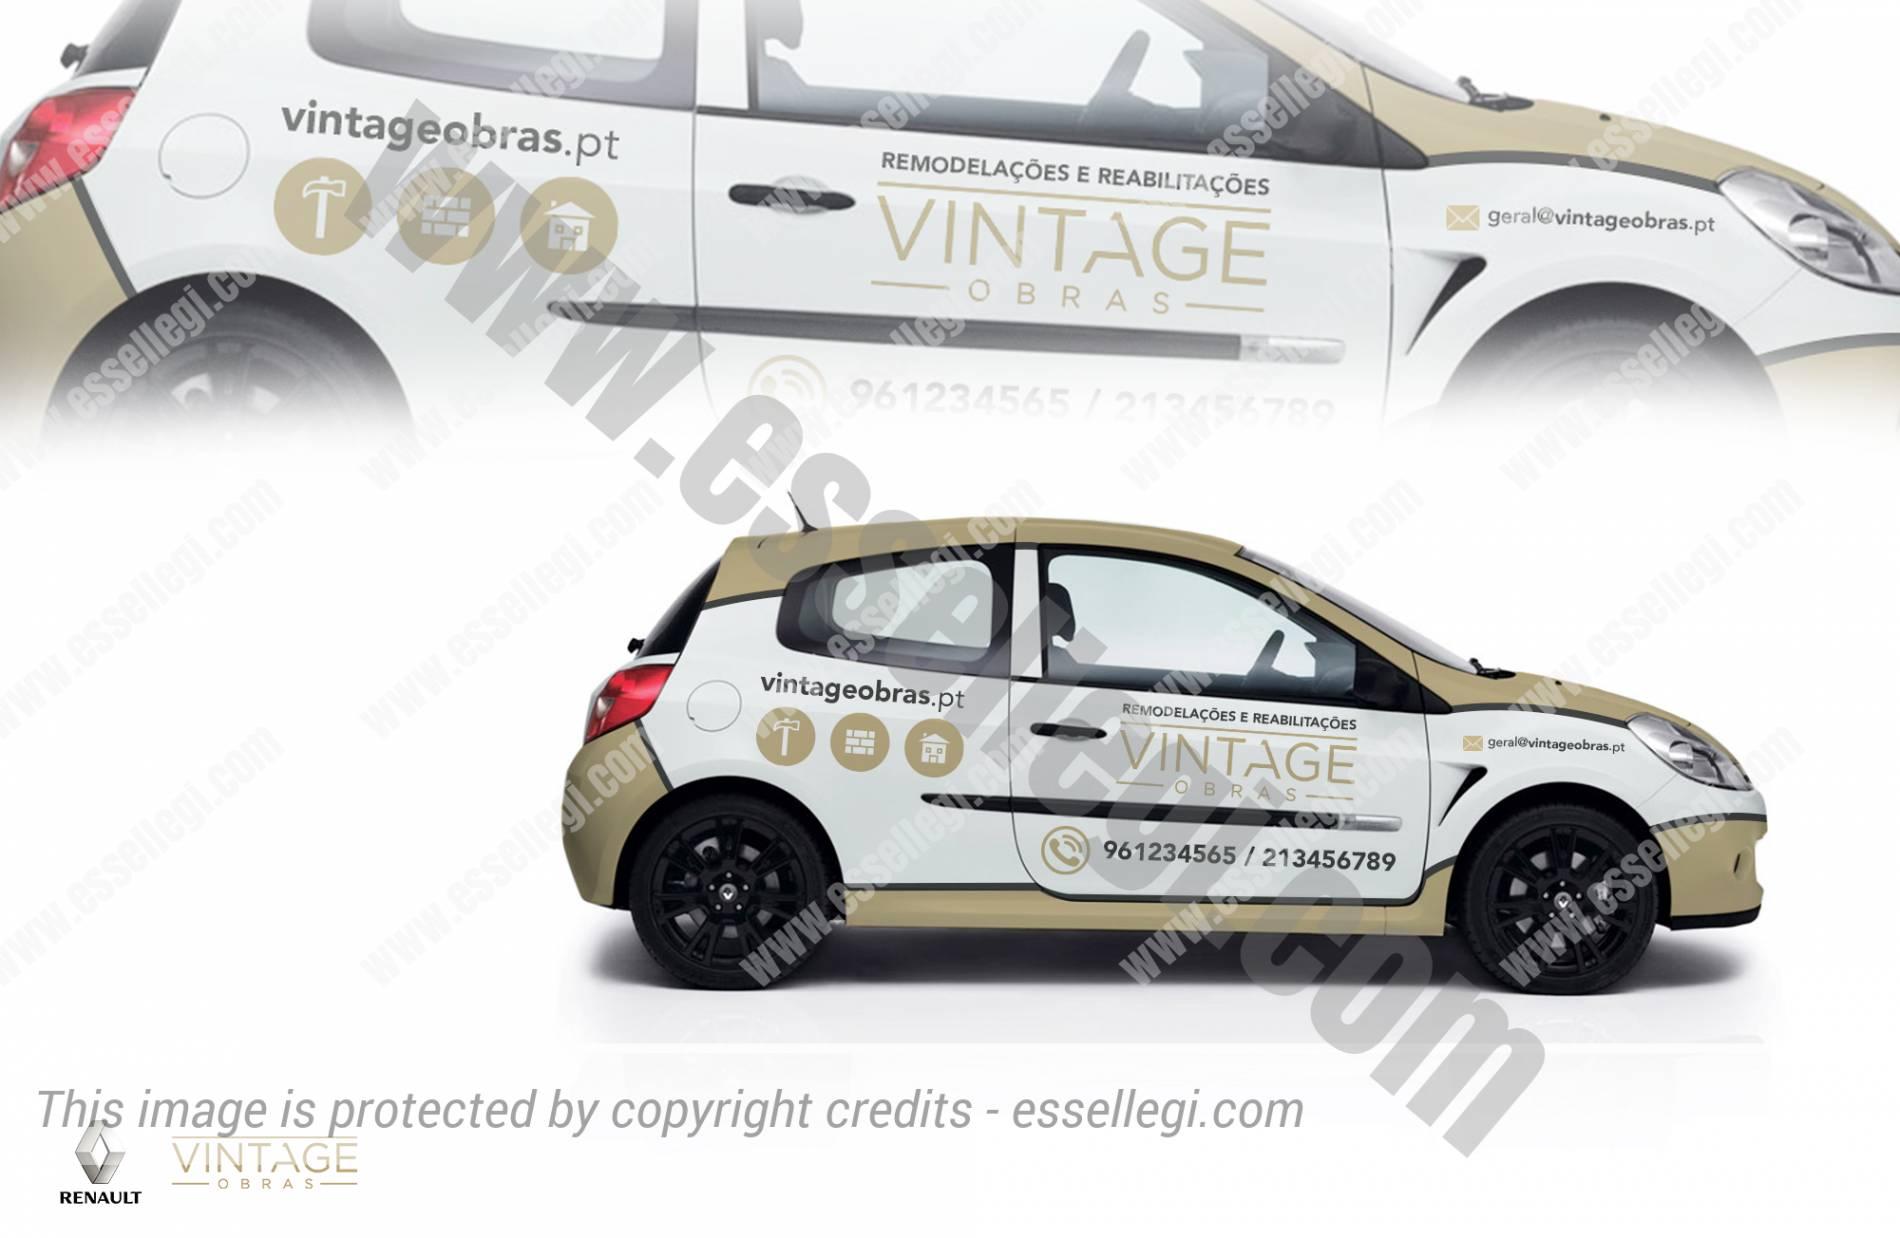 Design car wrap - Vintage Obras Renault Clio Car Wrap Design